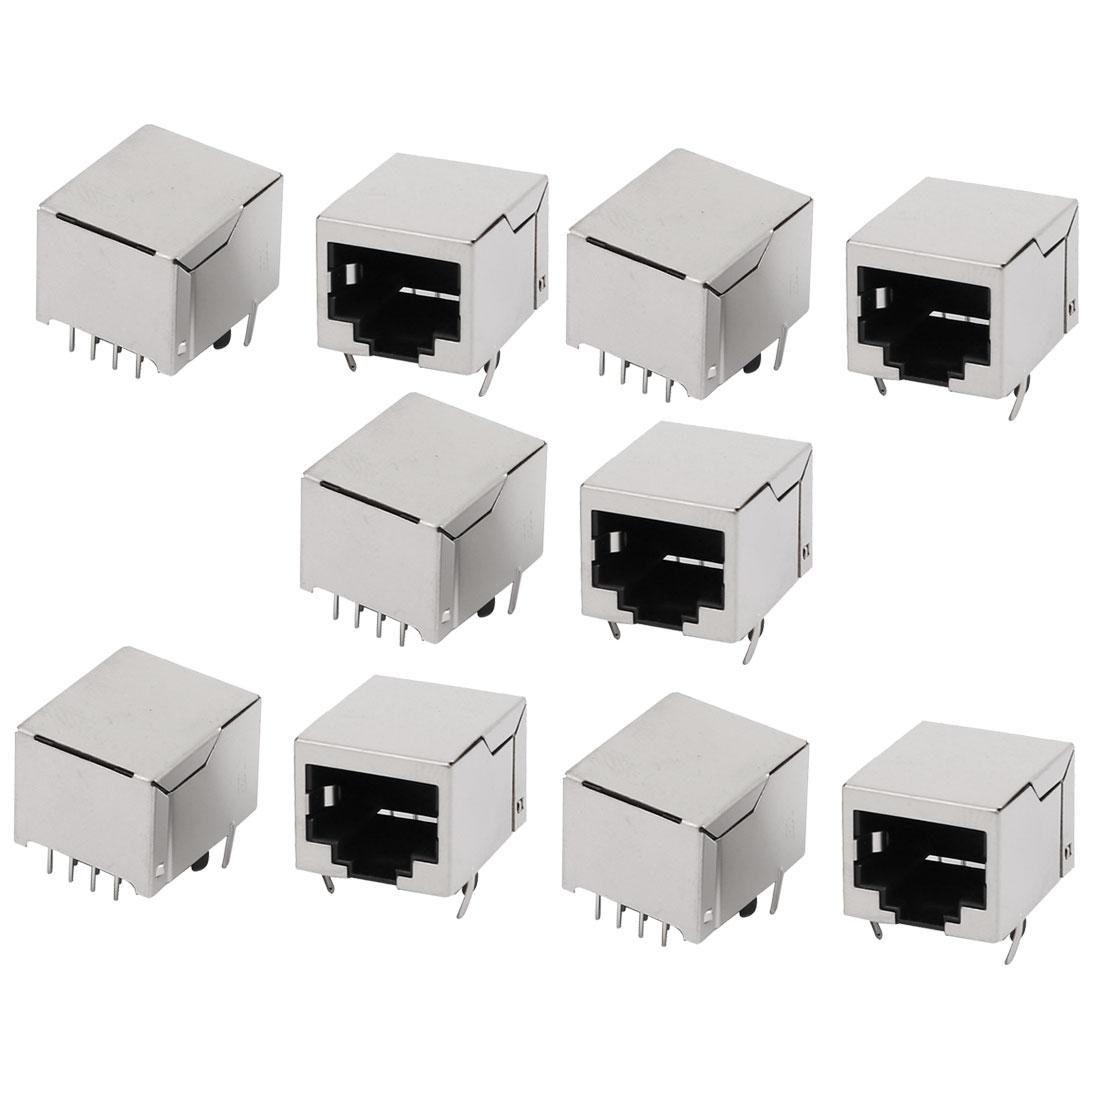 RJ45 8P8C Female PCB Mounting Modular Jack Ethernet Network Connector 10pcs